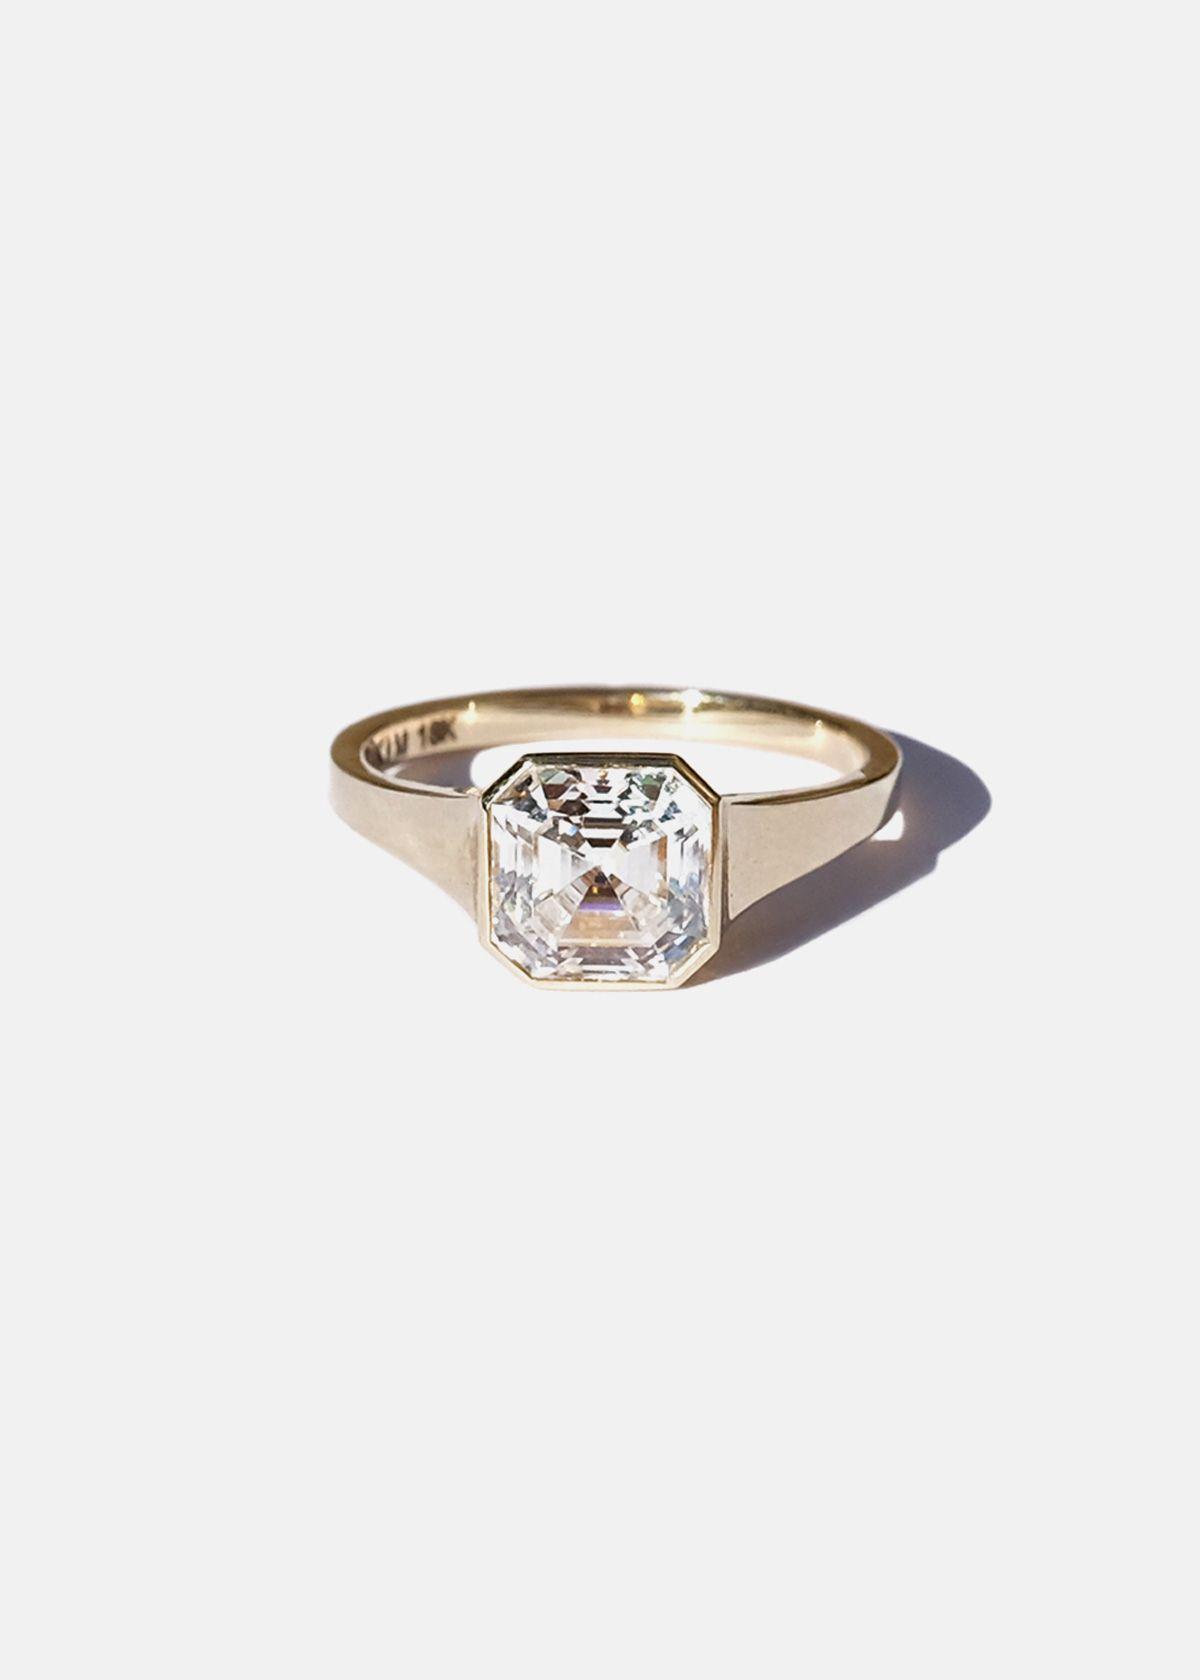 Asscher Diamond Cosma Ring Katkim Fine Jewelry Asscher Diamond Ladies Diamond Rings Bezel Diamond Rings